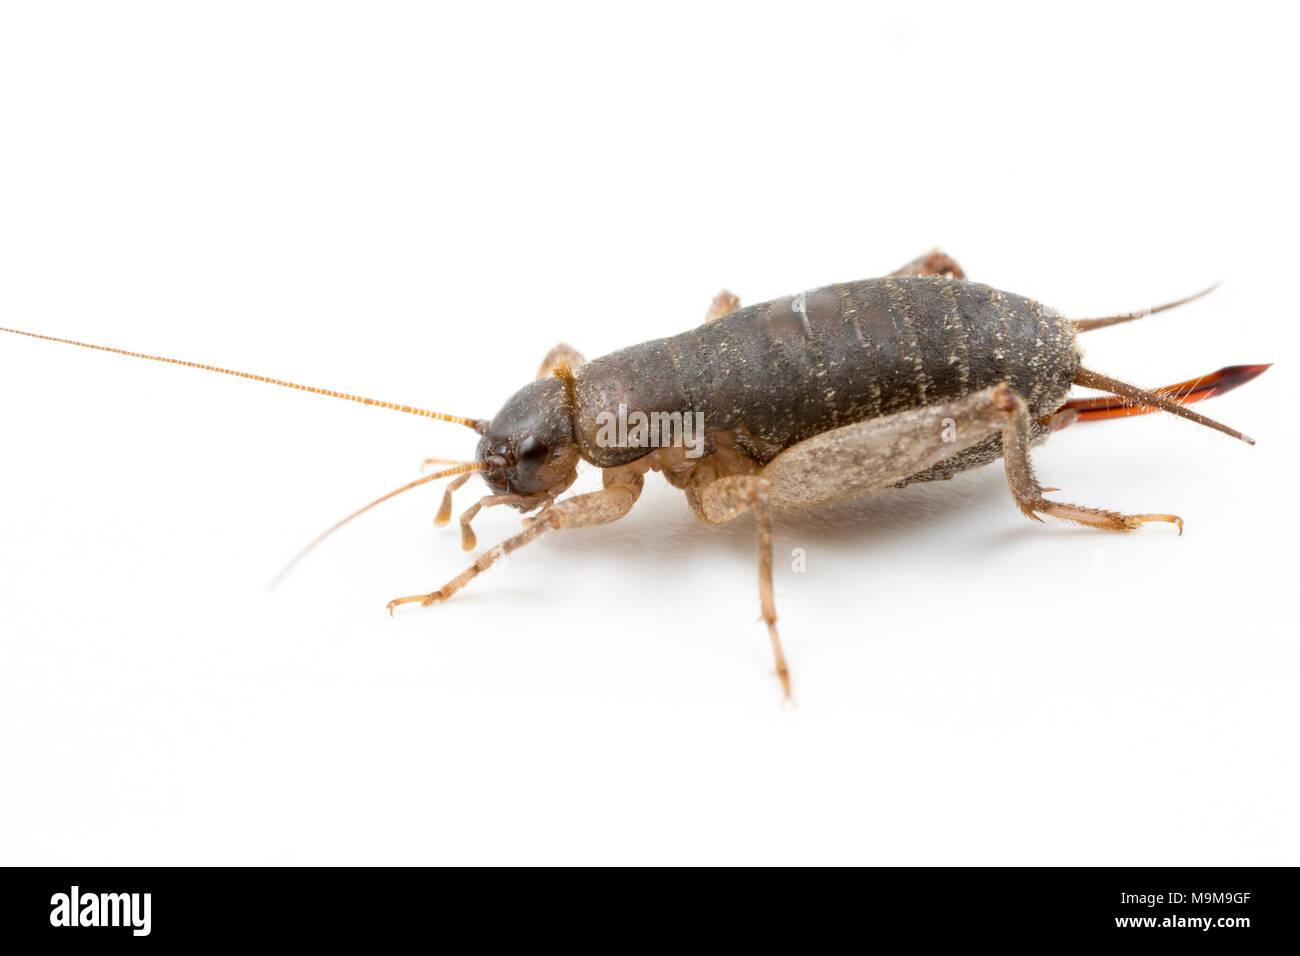 A female Scaly Cricket, Pseudomogoplistes vicentae, found on Chesil beach Dorset England UK GB on a white background - Stock Image